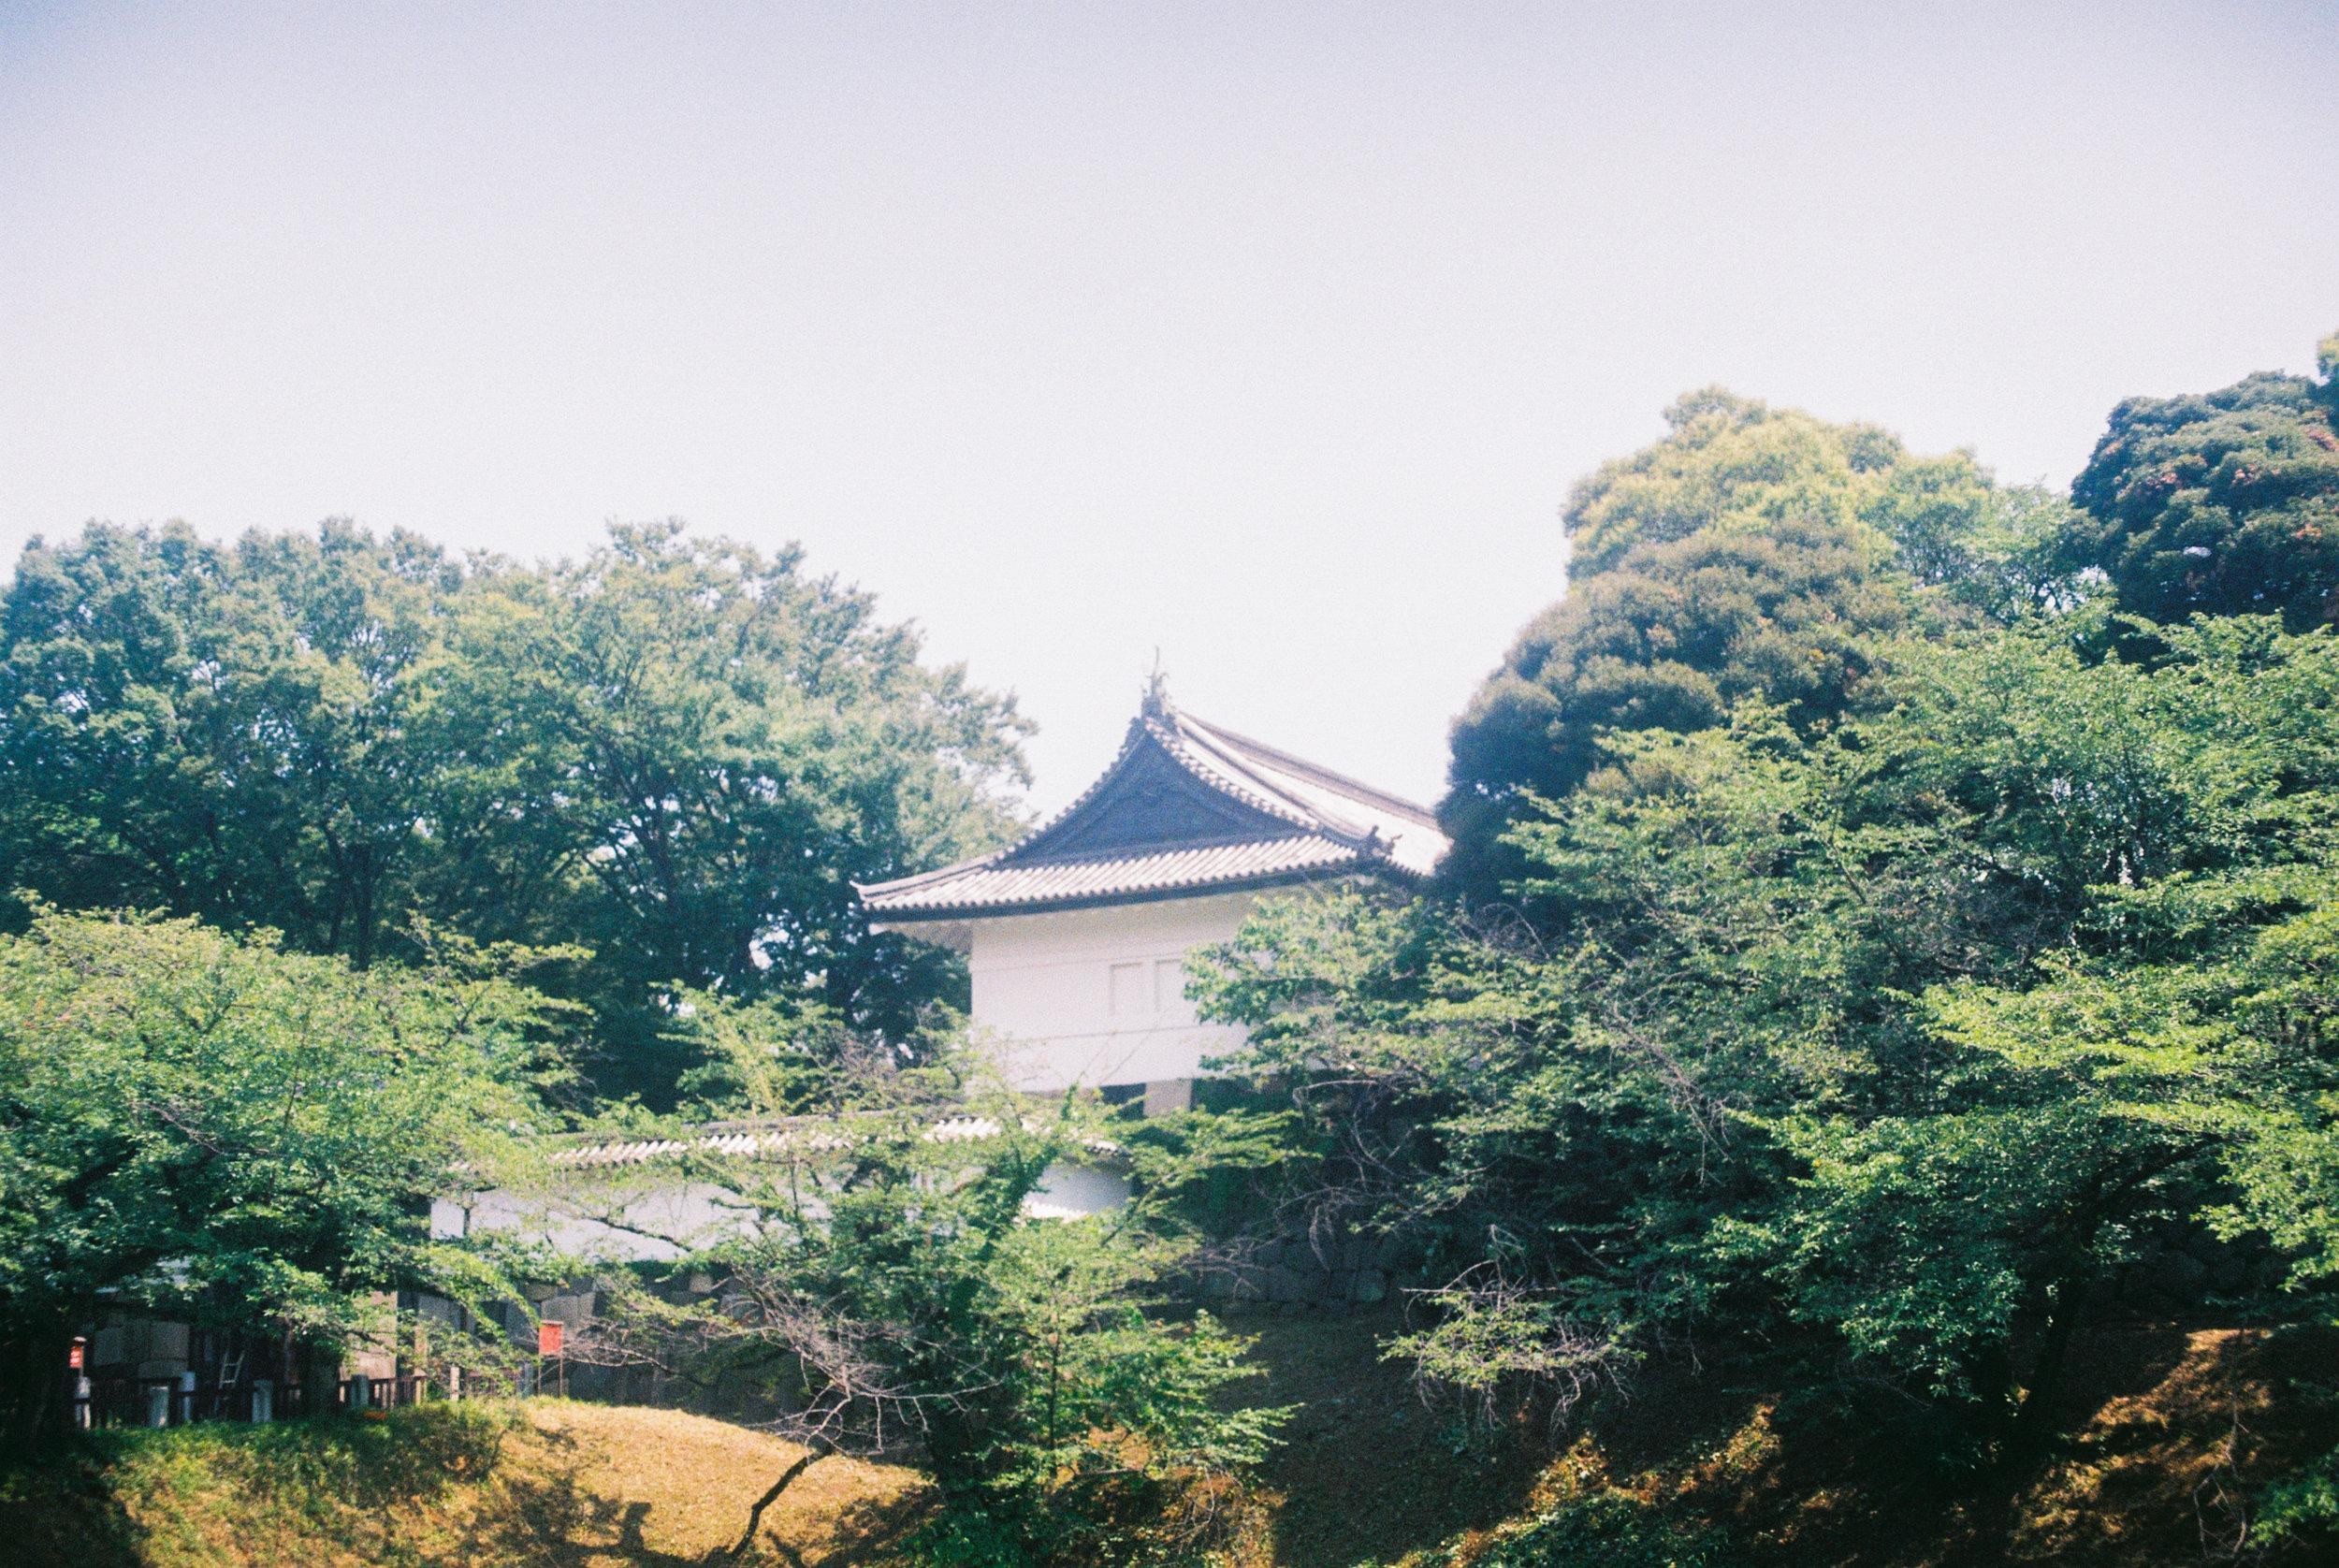 japan-chiyoda-benjaminandrew.jpg